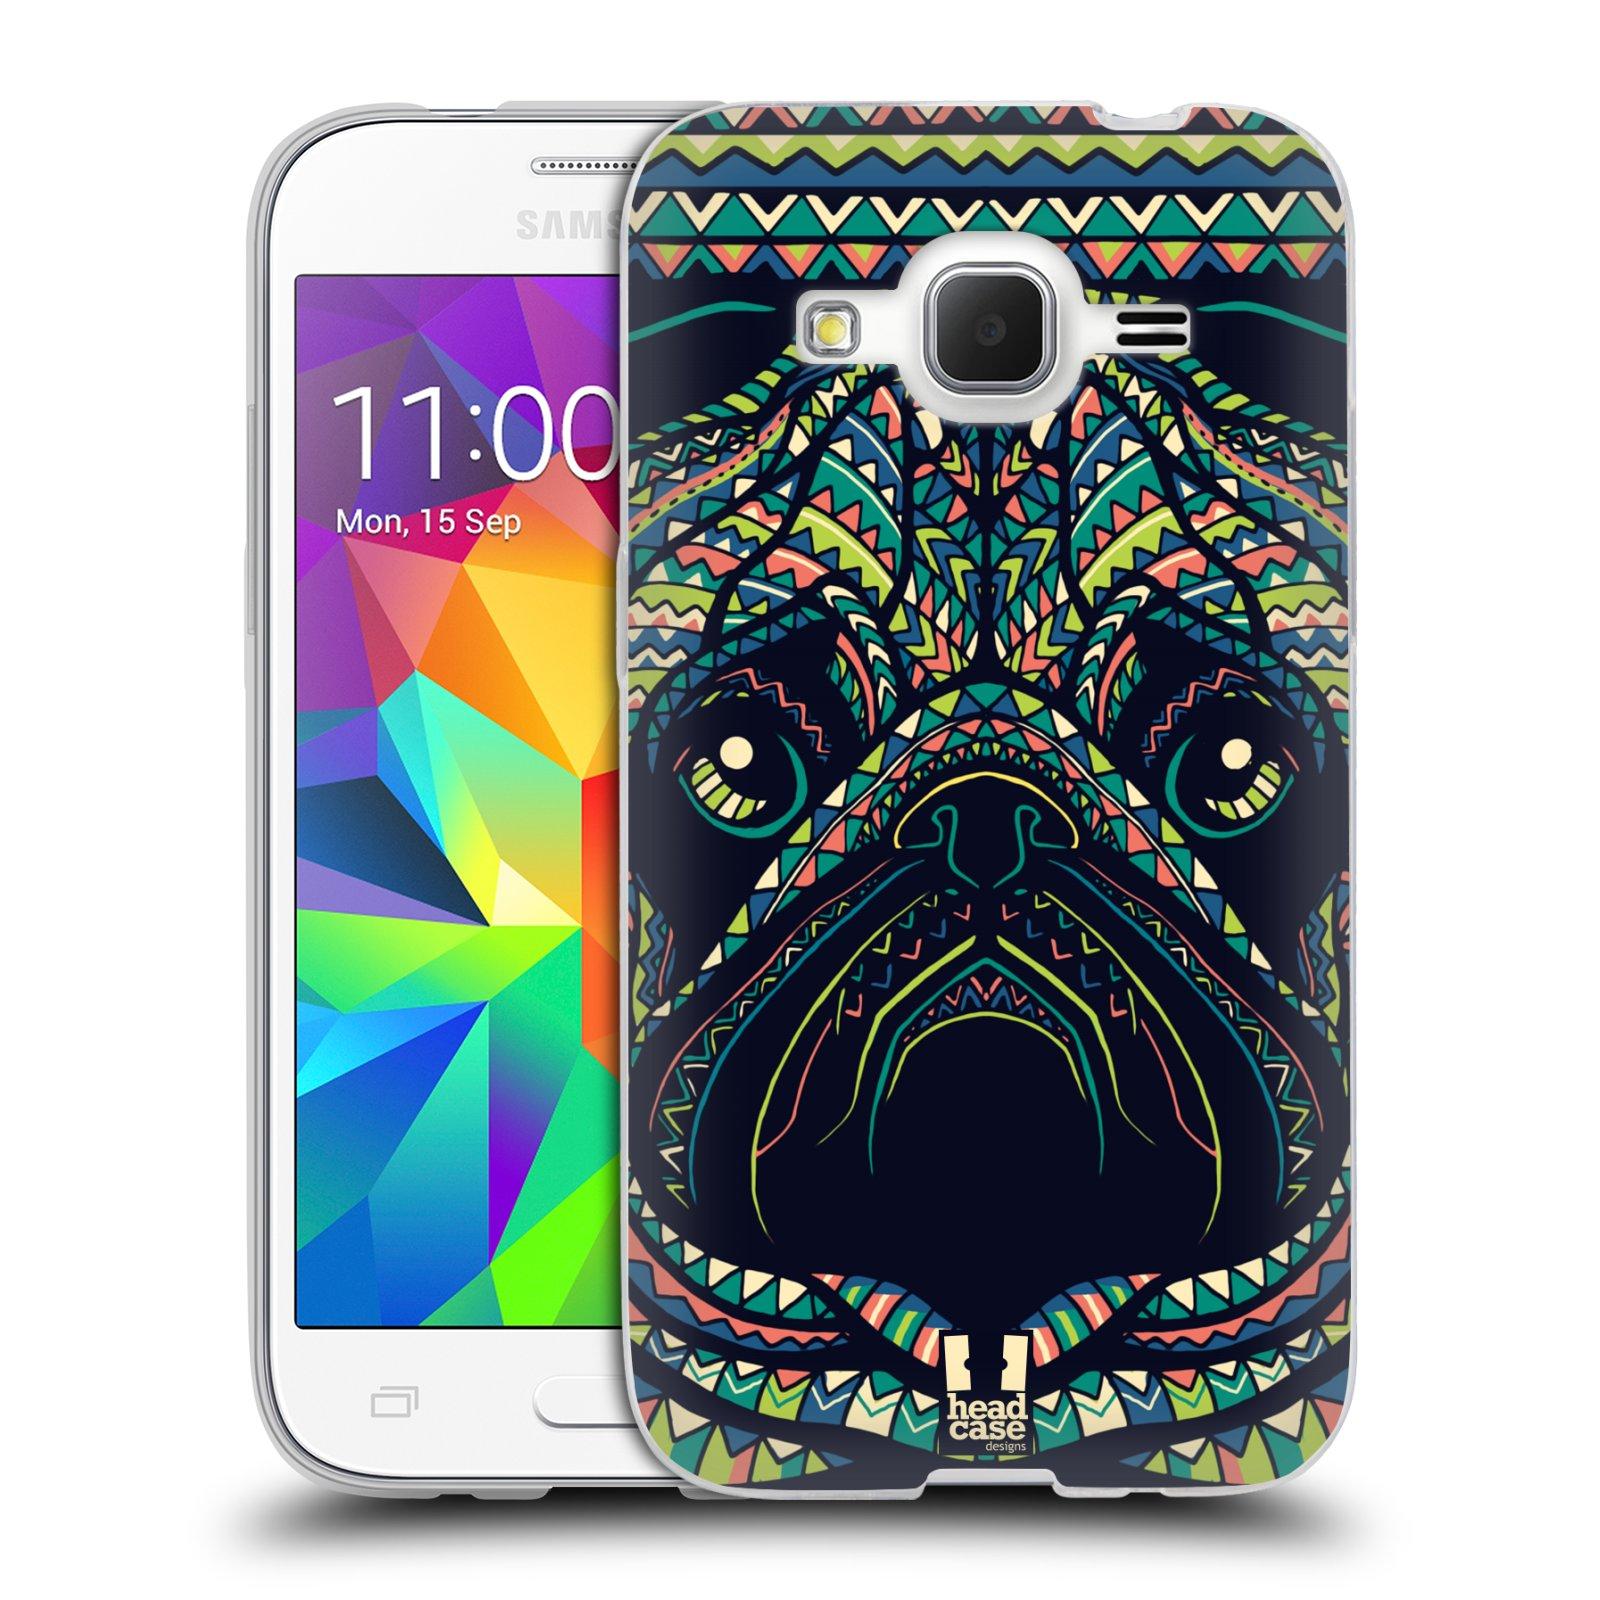 HEAD CASE silikonový obal na mobil Samsung Galaxy Core Prime (G360) vzor Aztécký motiv zvíře 3 mopsík